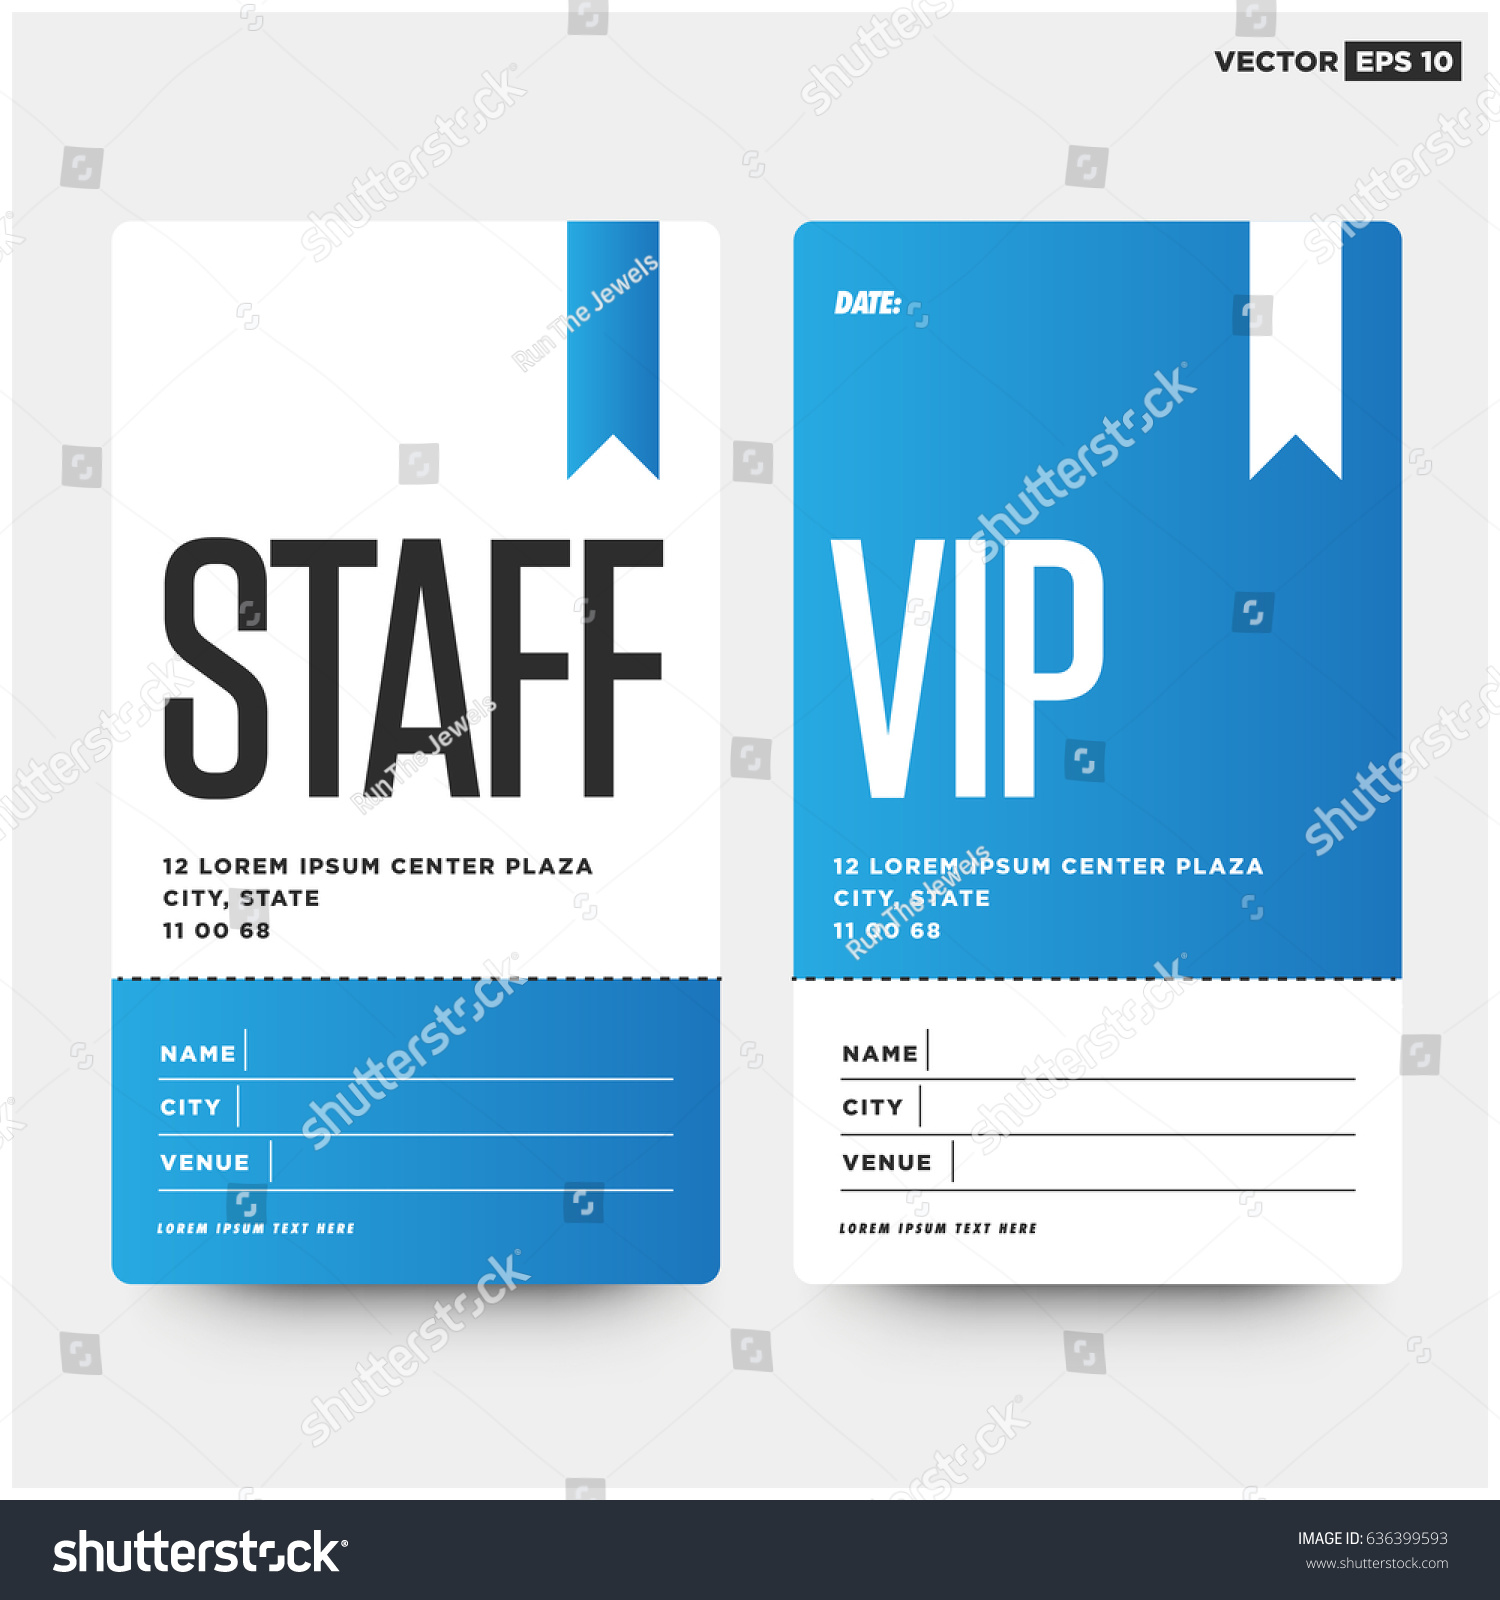 staff vip entry id card design のベクター画像素材 ロイヤリティ